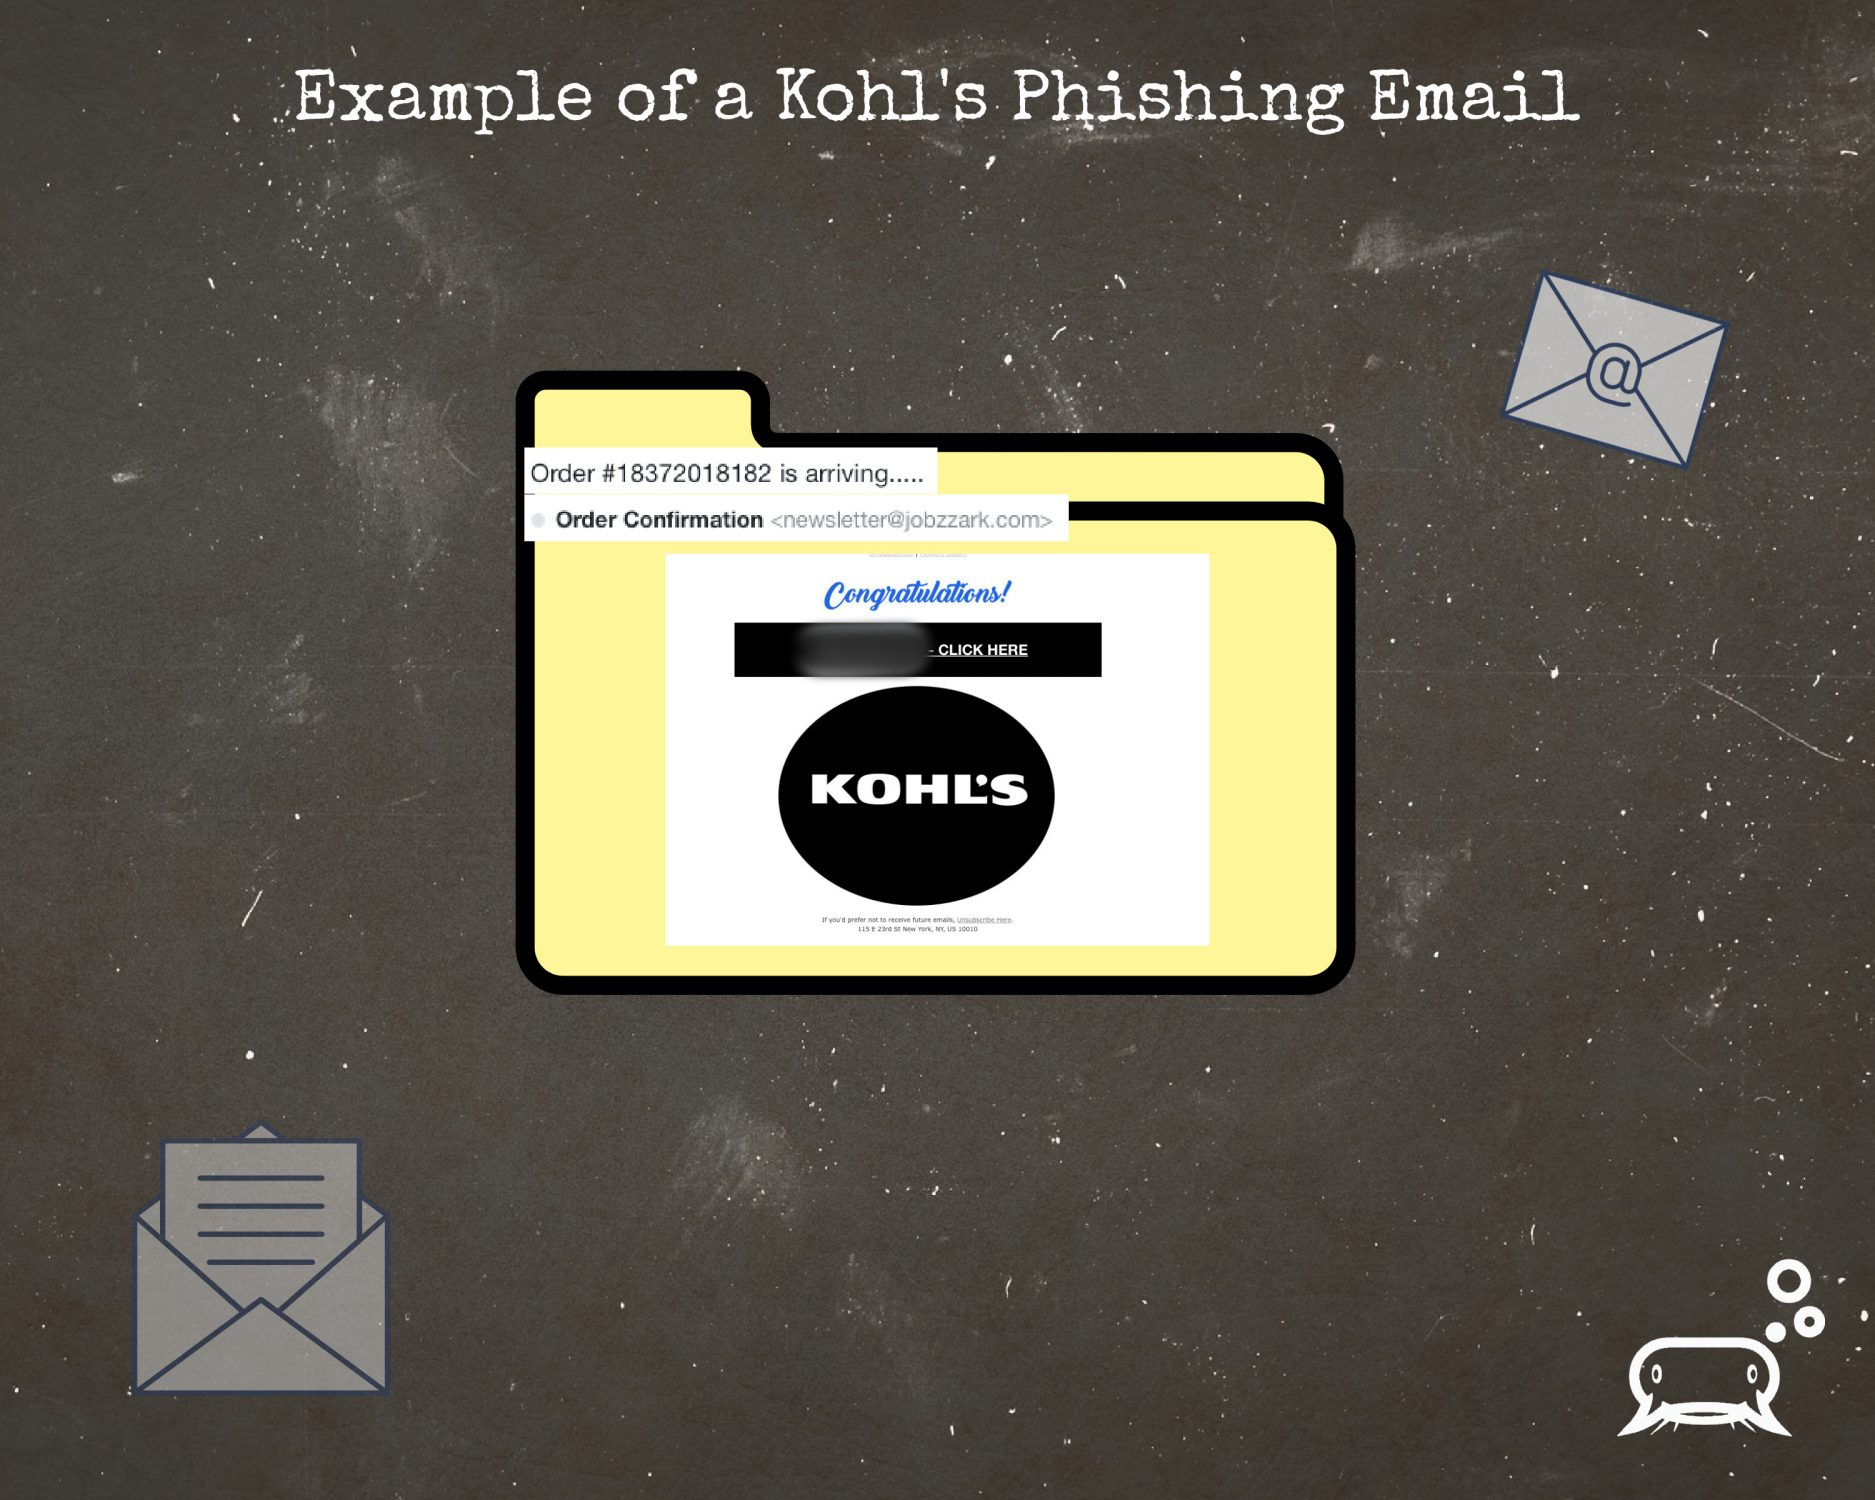 Kohls-Phishing-Email-Example